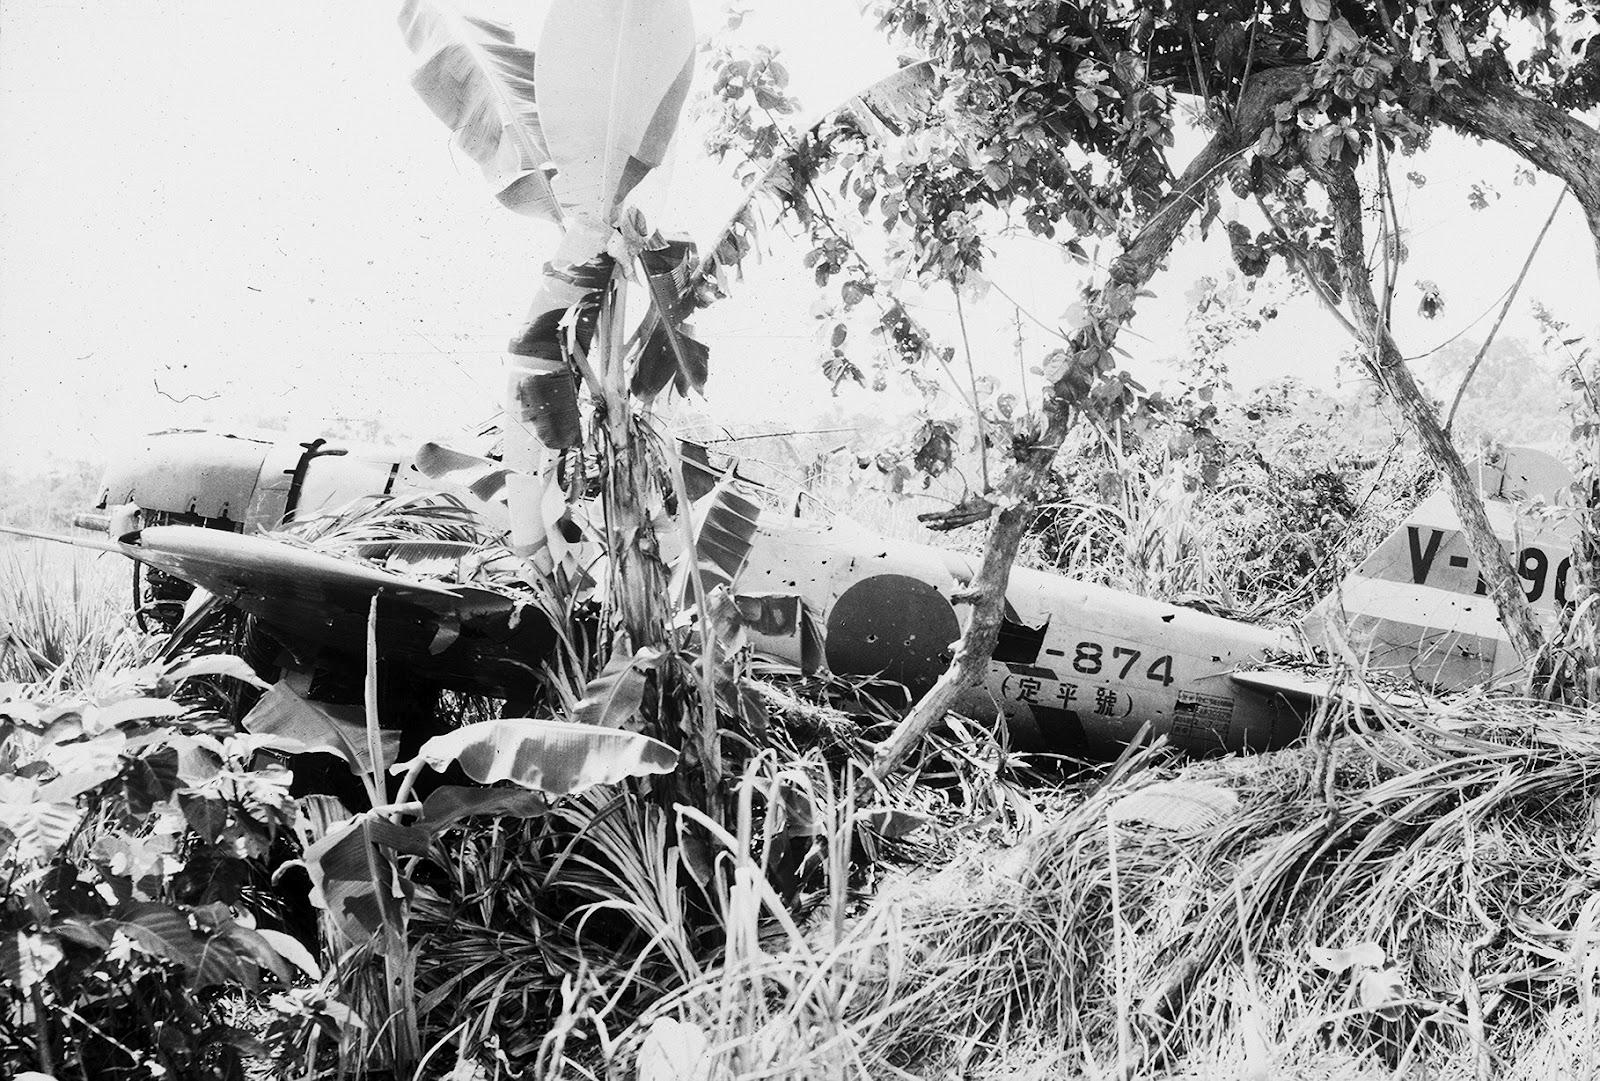 Mitsubishi A6M3 32 Zero JNAF 2nd NAG V 190 HK 874 Buna 1942 04